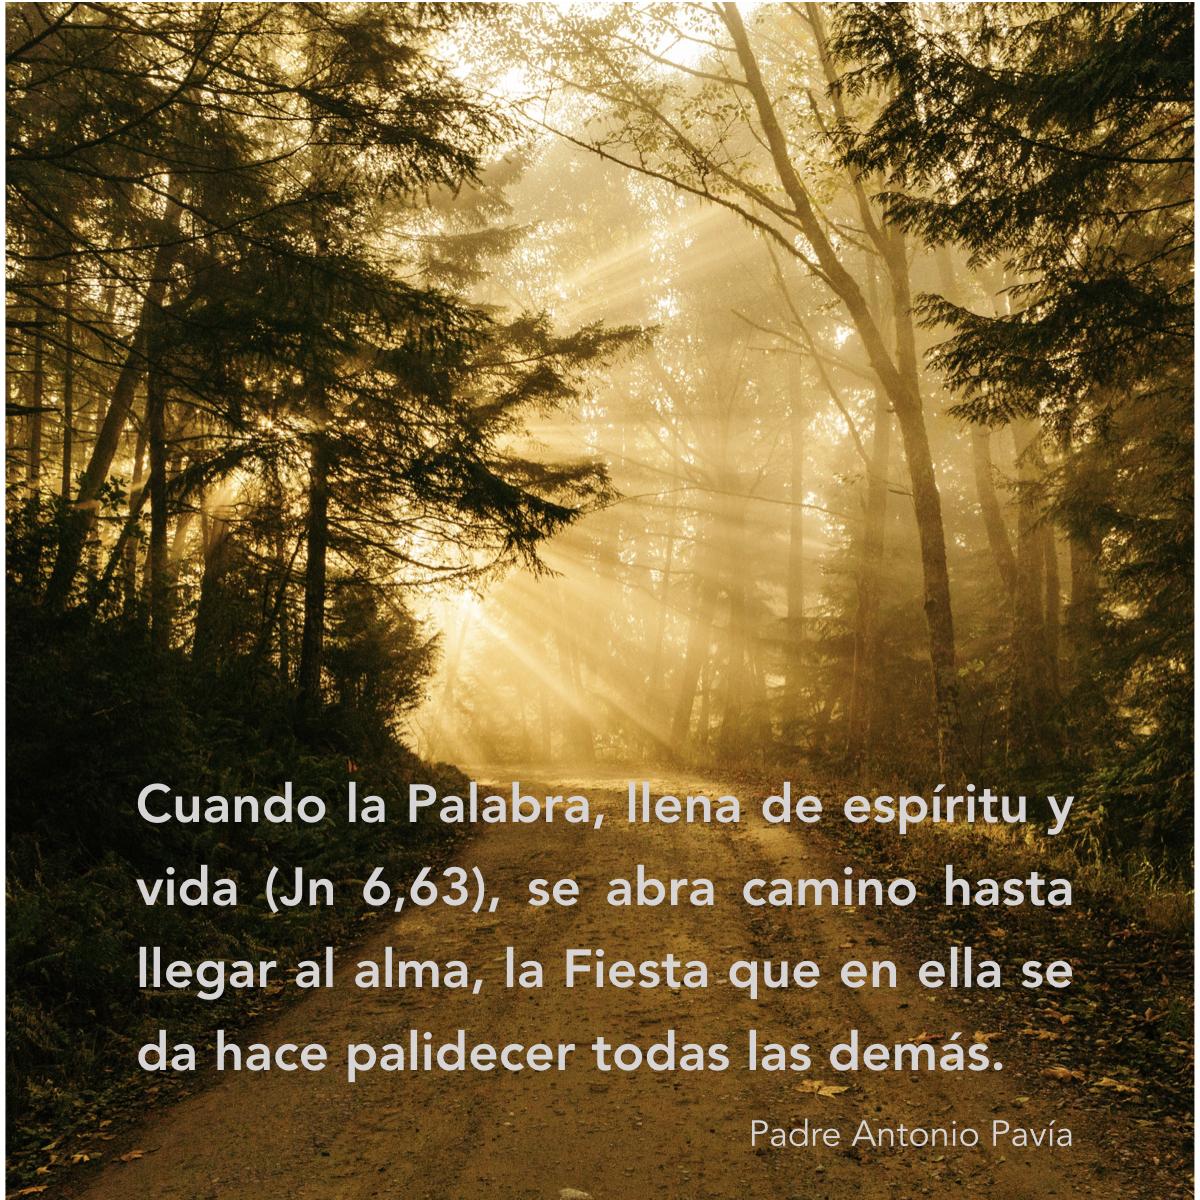 86341-toque-del-alma